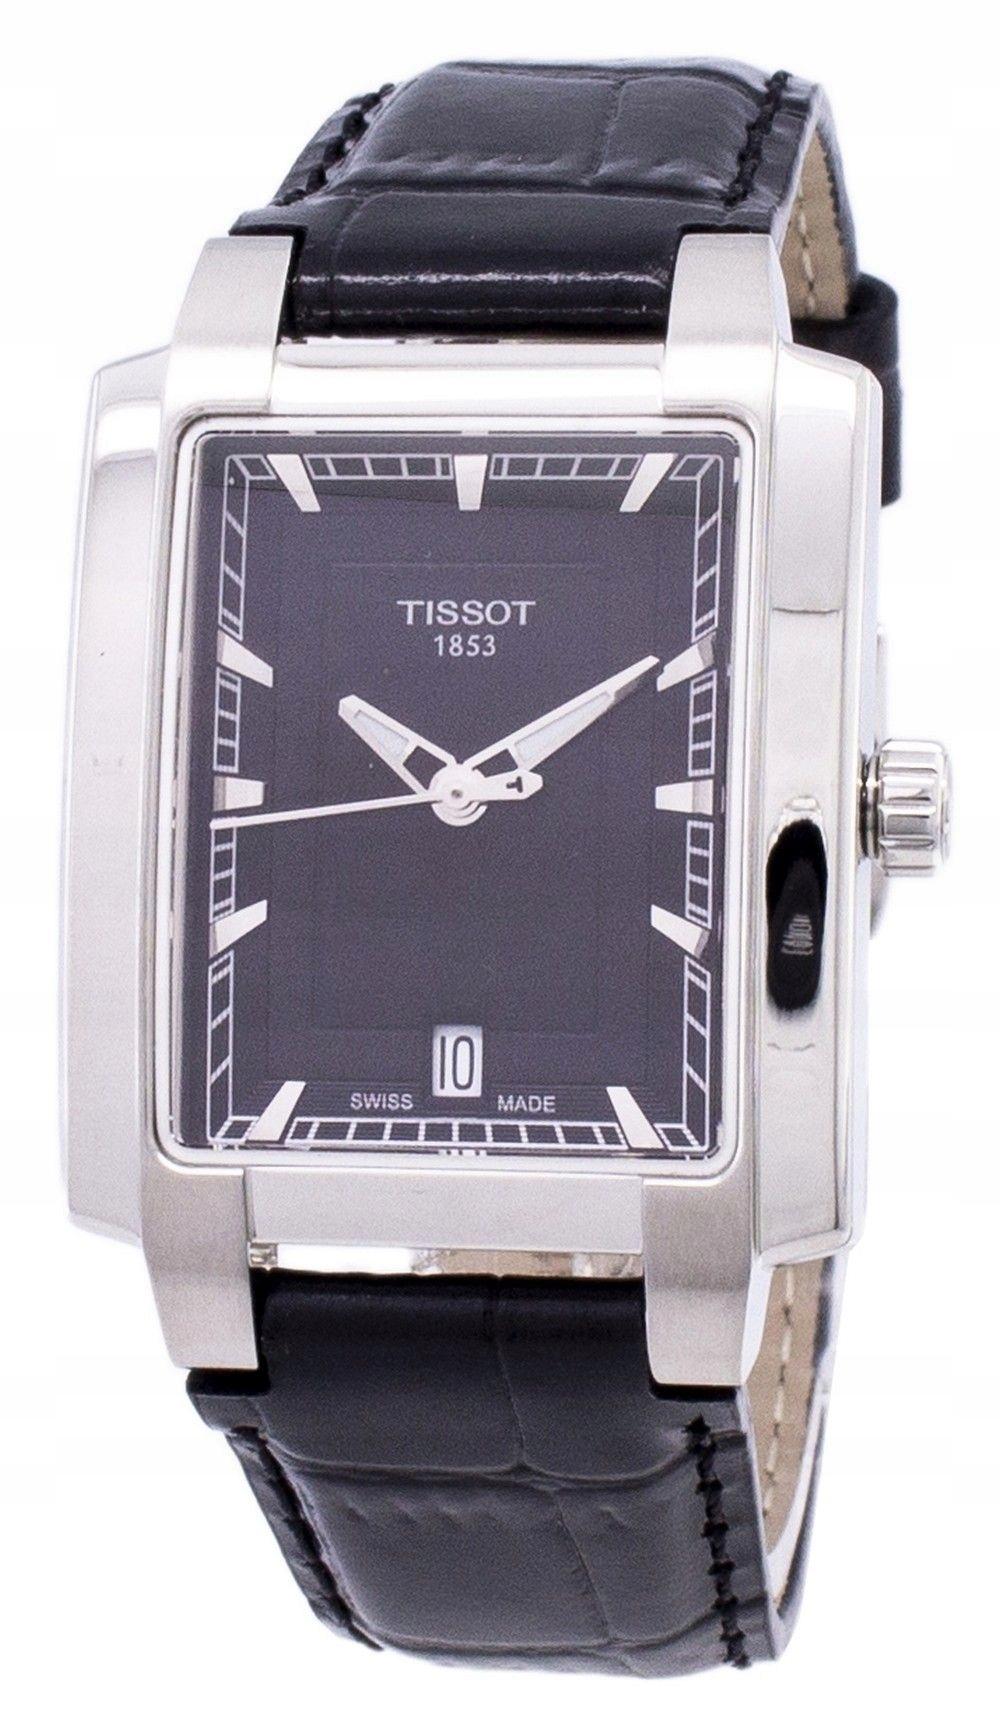 Damski zegarek TISSOT T061.310.16.051.00